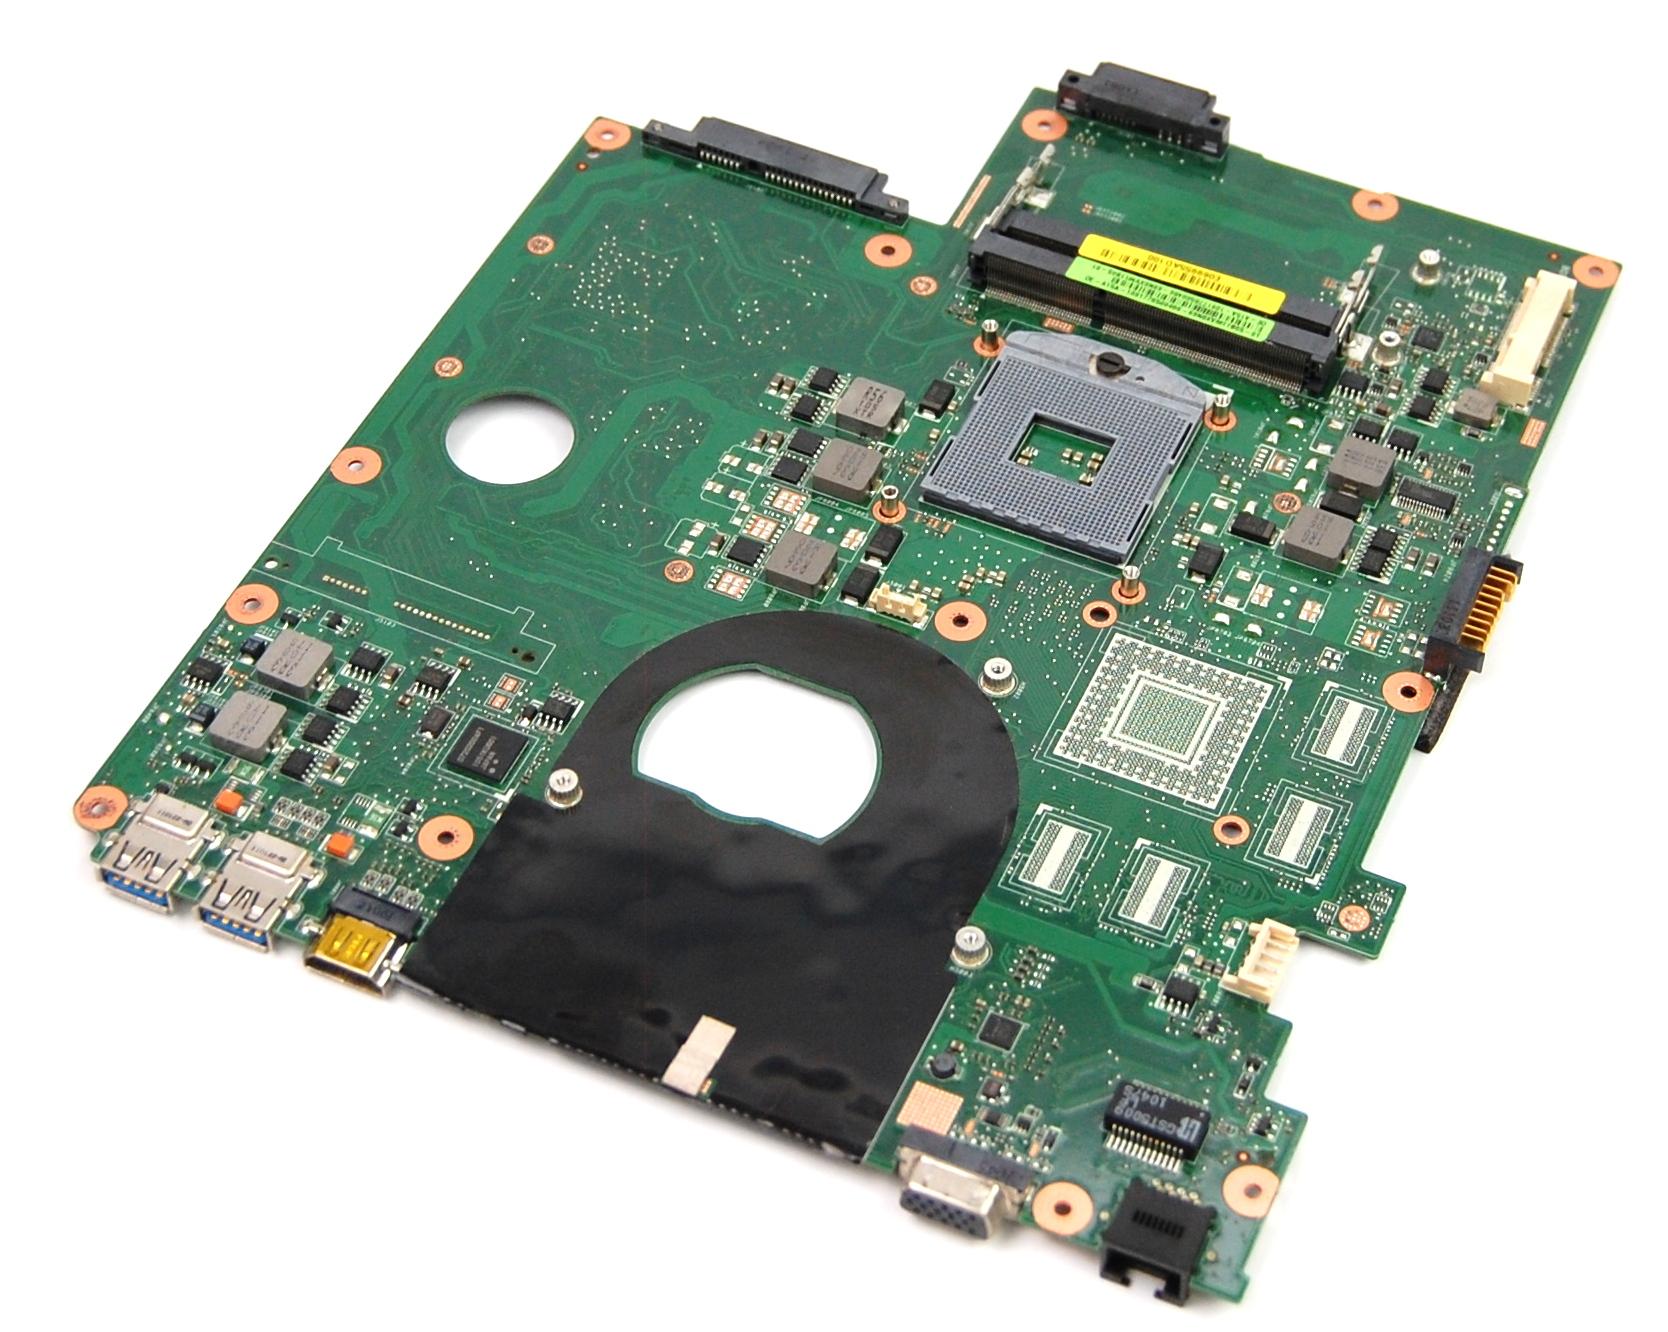 Novatech 69N0XVM11B05-01 A15A Socket rPGA-988B Laptop Motherboard - 08N1-0L14J00